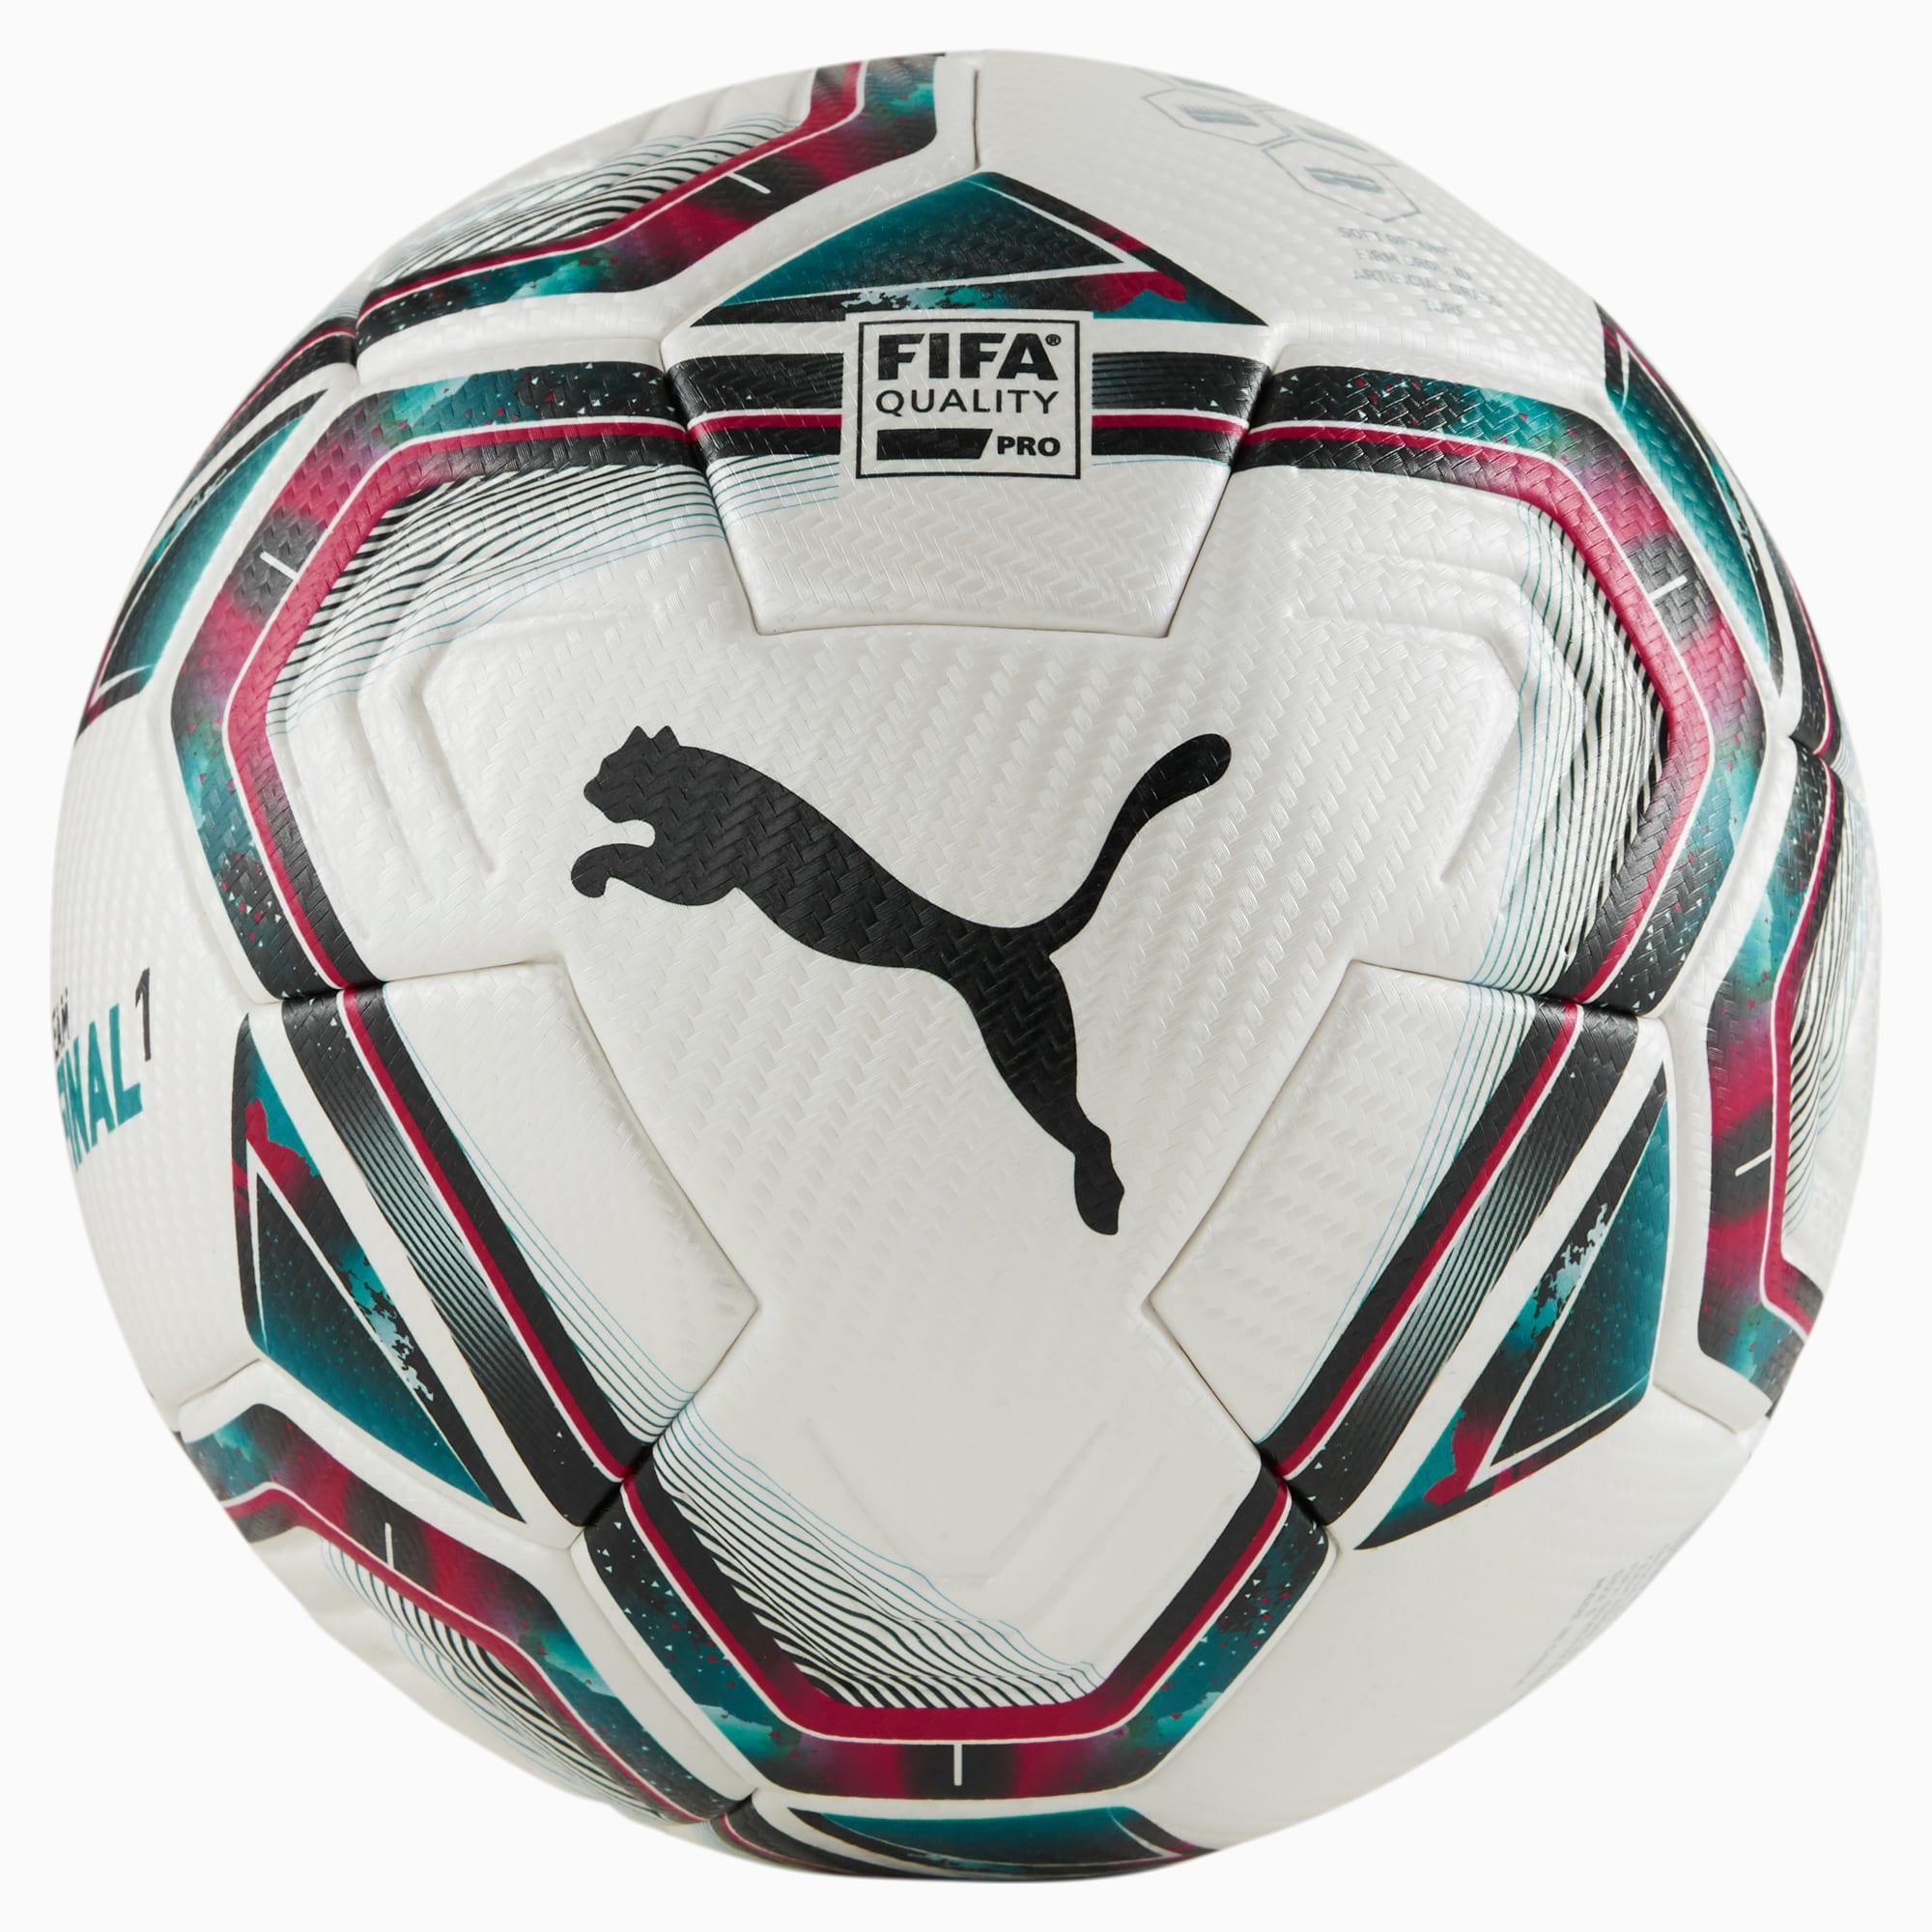 FINAL 1 FIFA Quality Pro Football